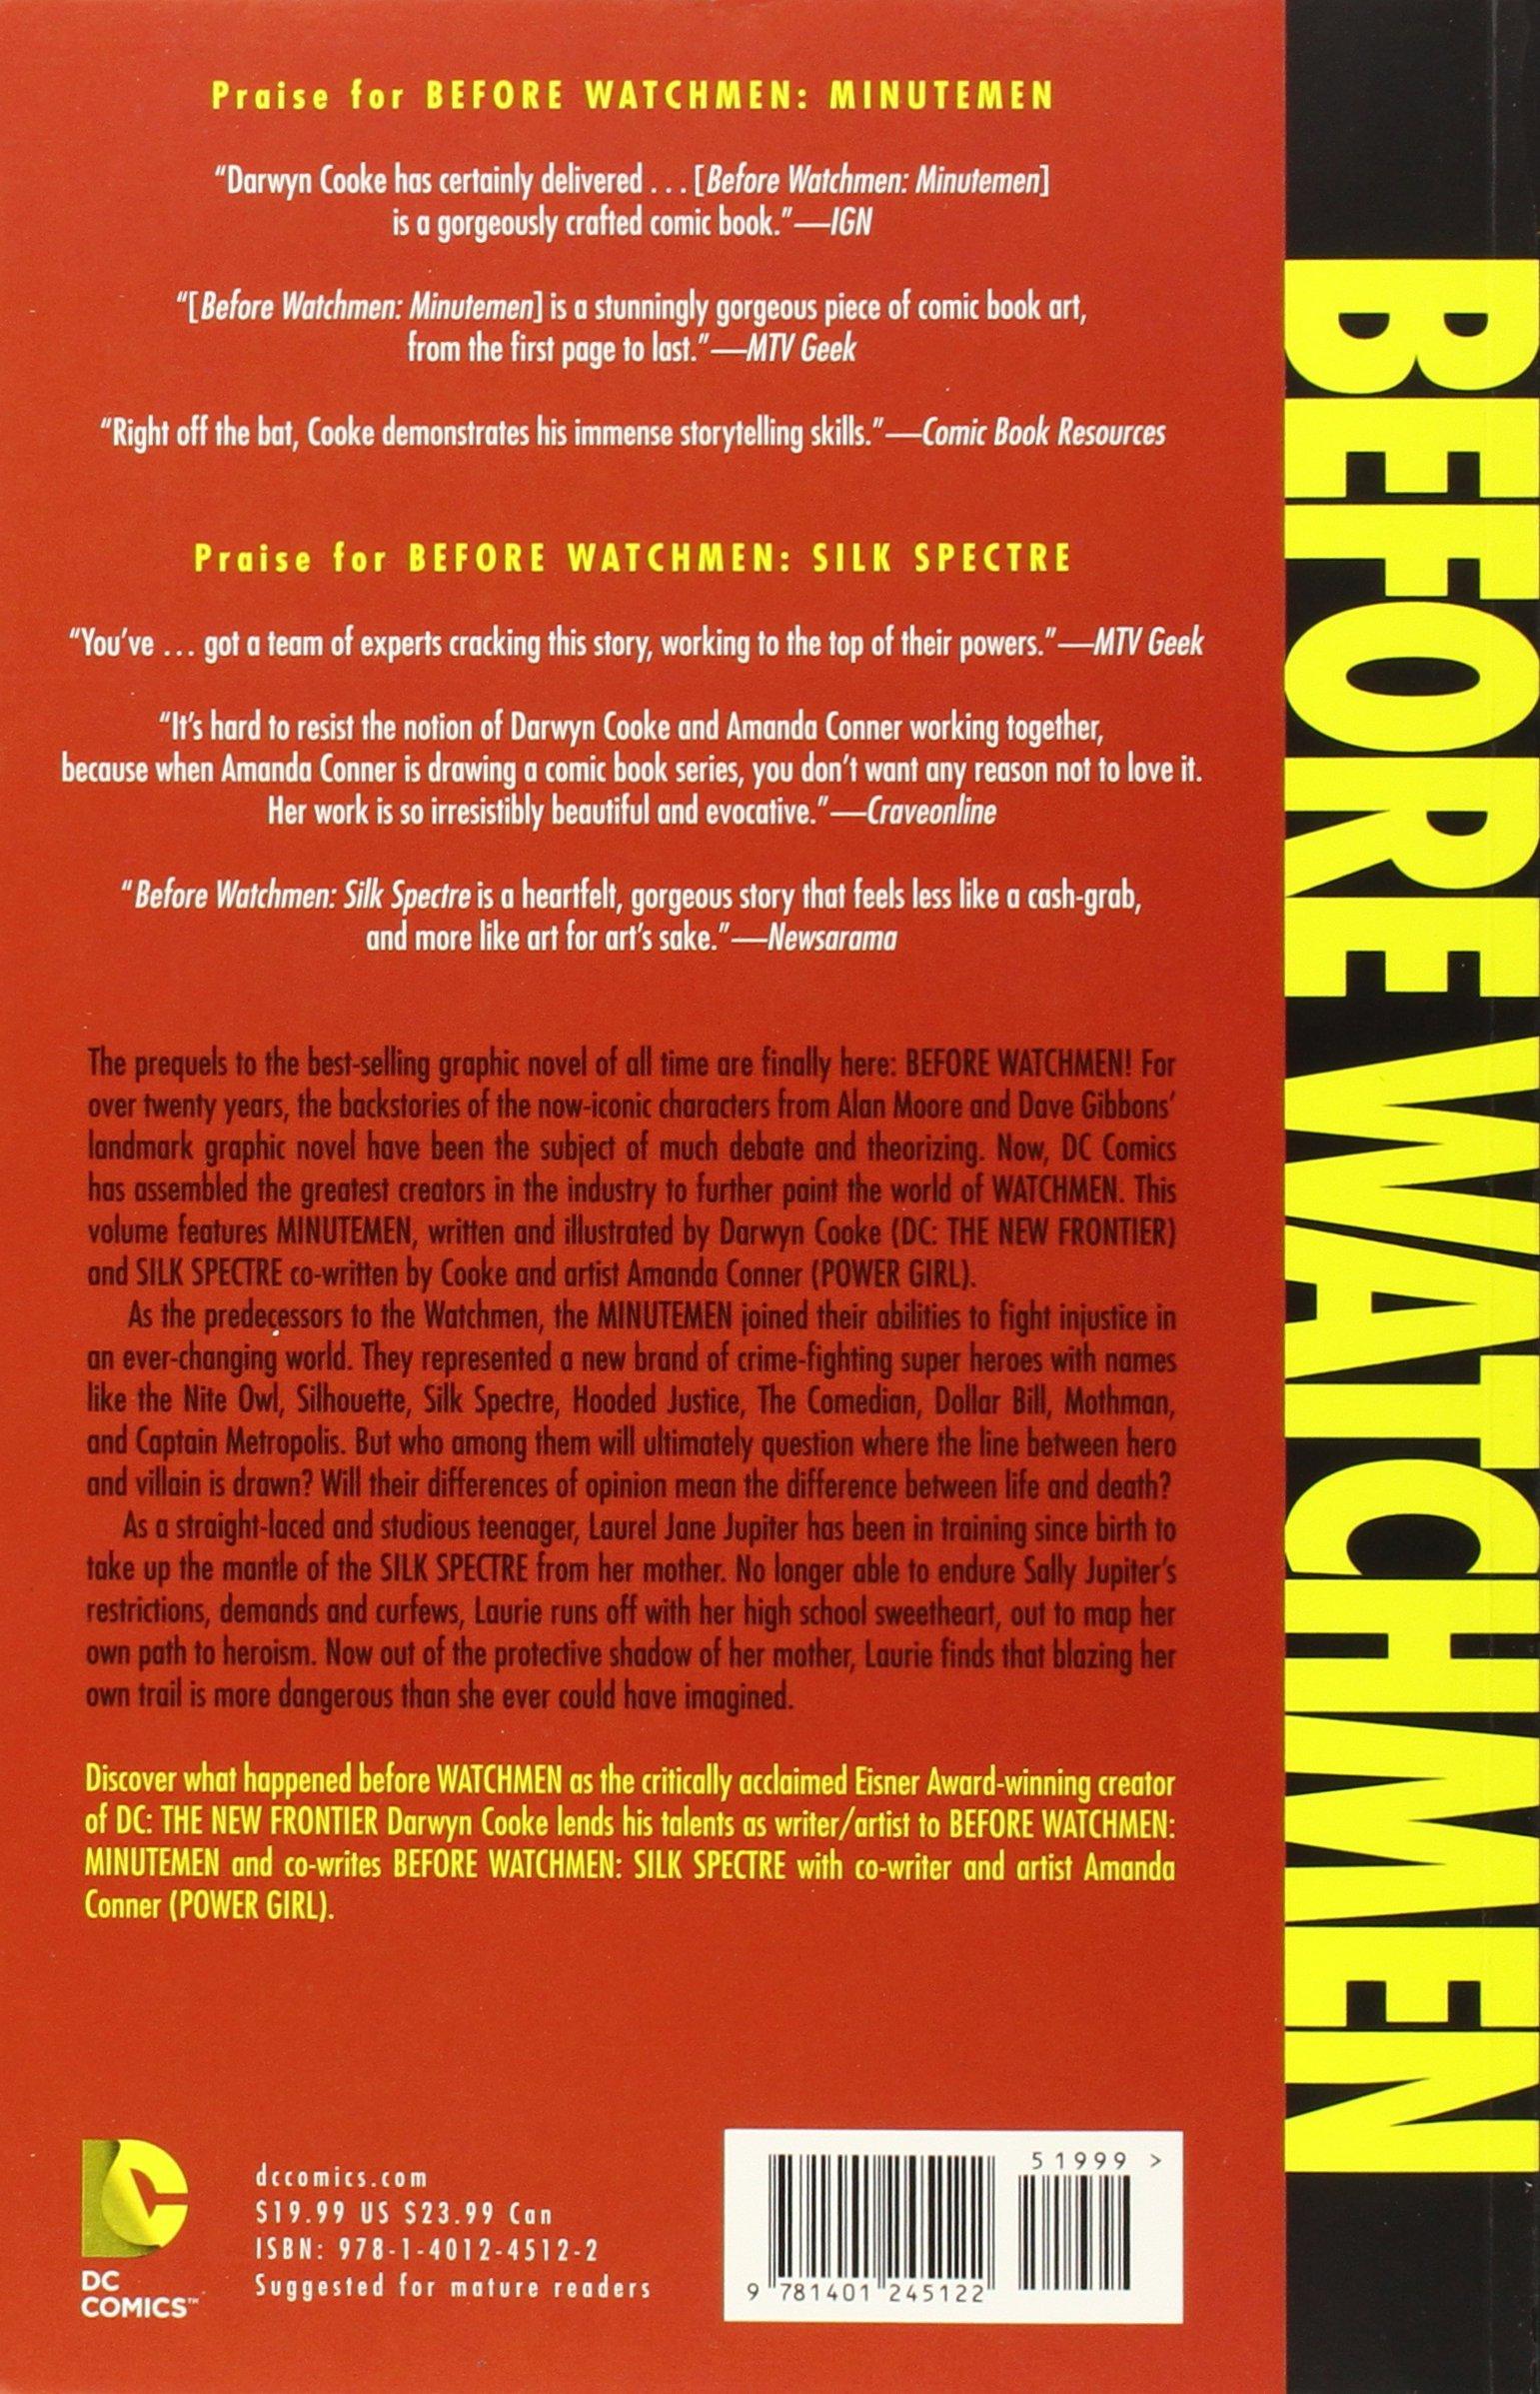 Conners sales group red hat project - Amazon Com Before Watchmen Minutemen Silk Spectre 8601404766176 Darwyn Cooke Amanda Conner Books